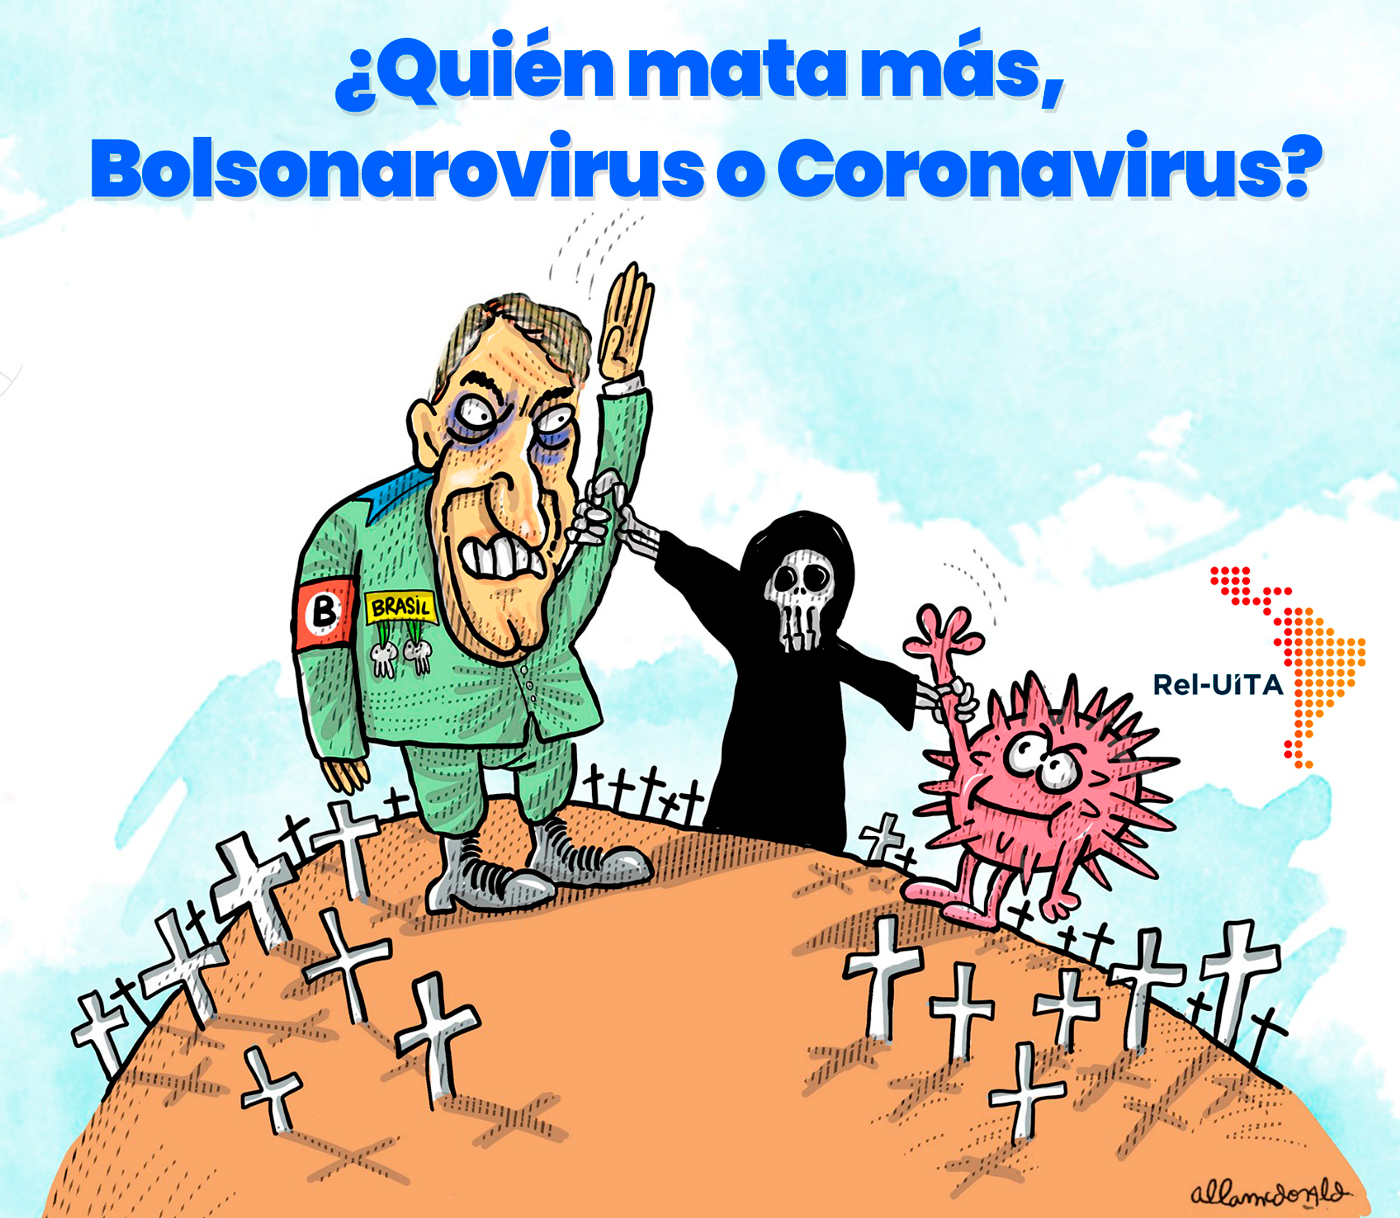 20200330_coronavirus-AlanEs